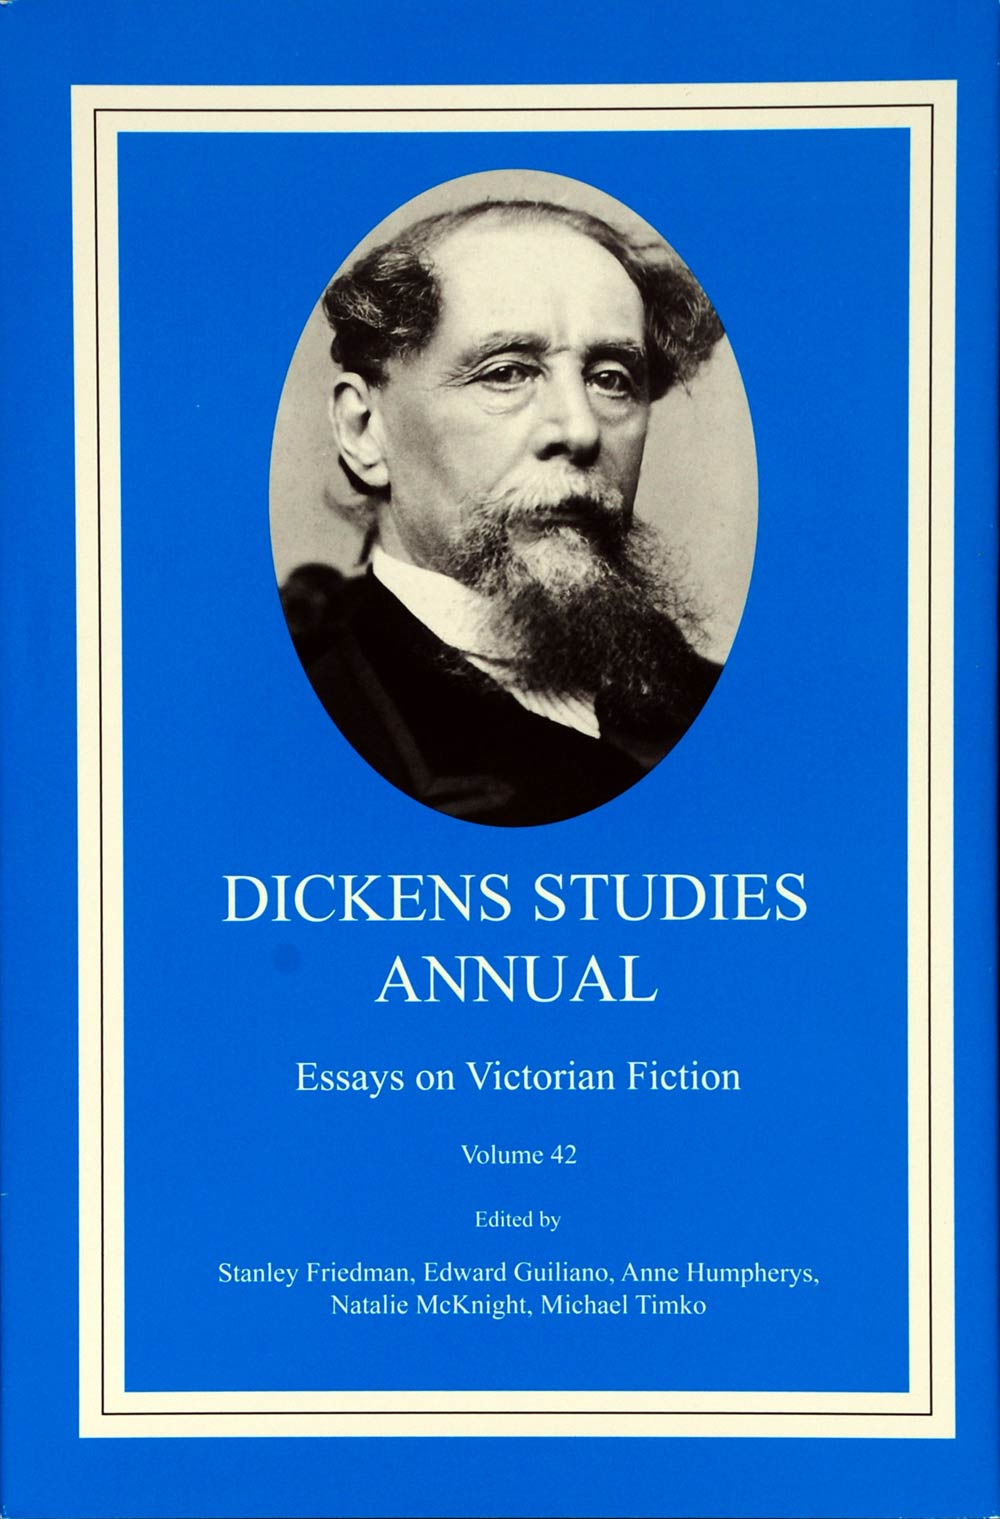 Stanley Friedman, Edward Guiliano [et al], editors. Dickens Studies Annual: Essays on Victorian Fiction. Volume 42. New York: AMS Press, Inc., 2011